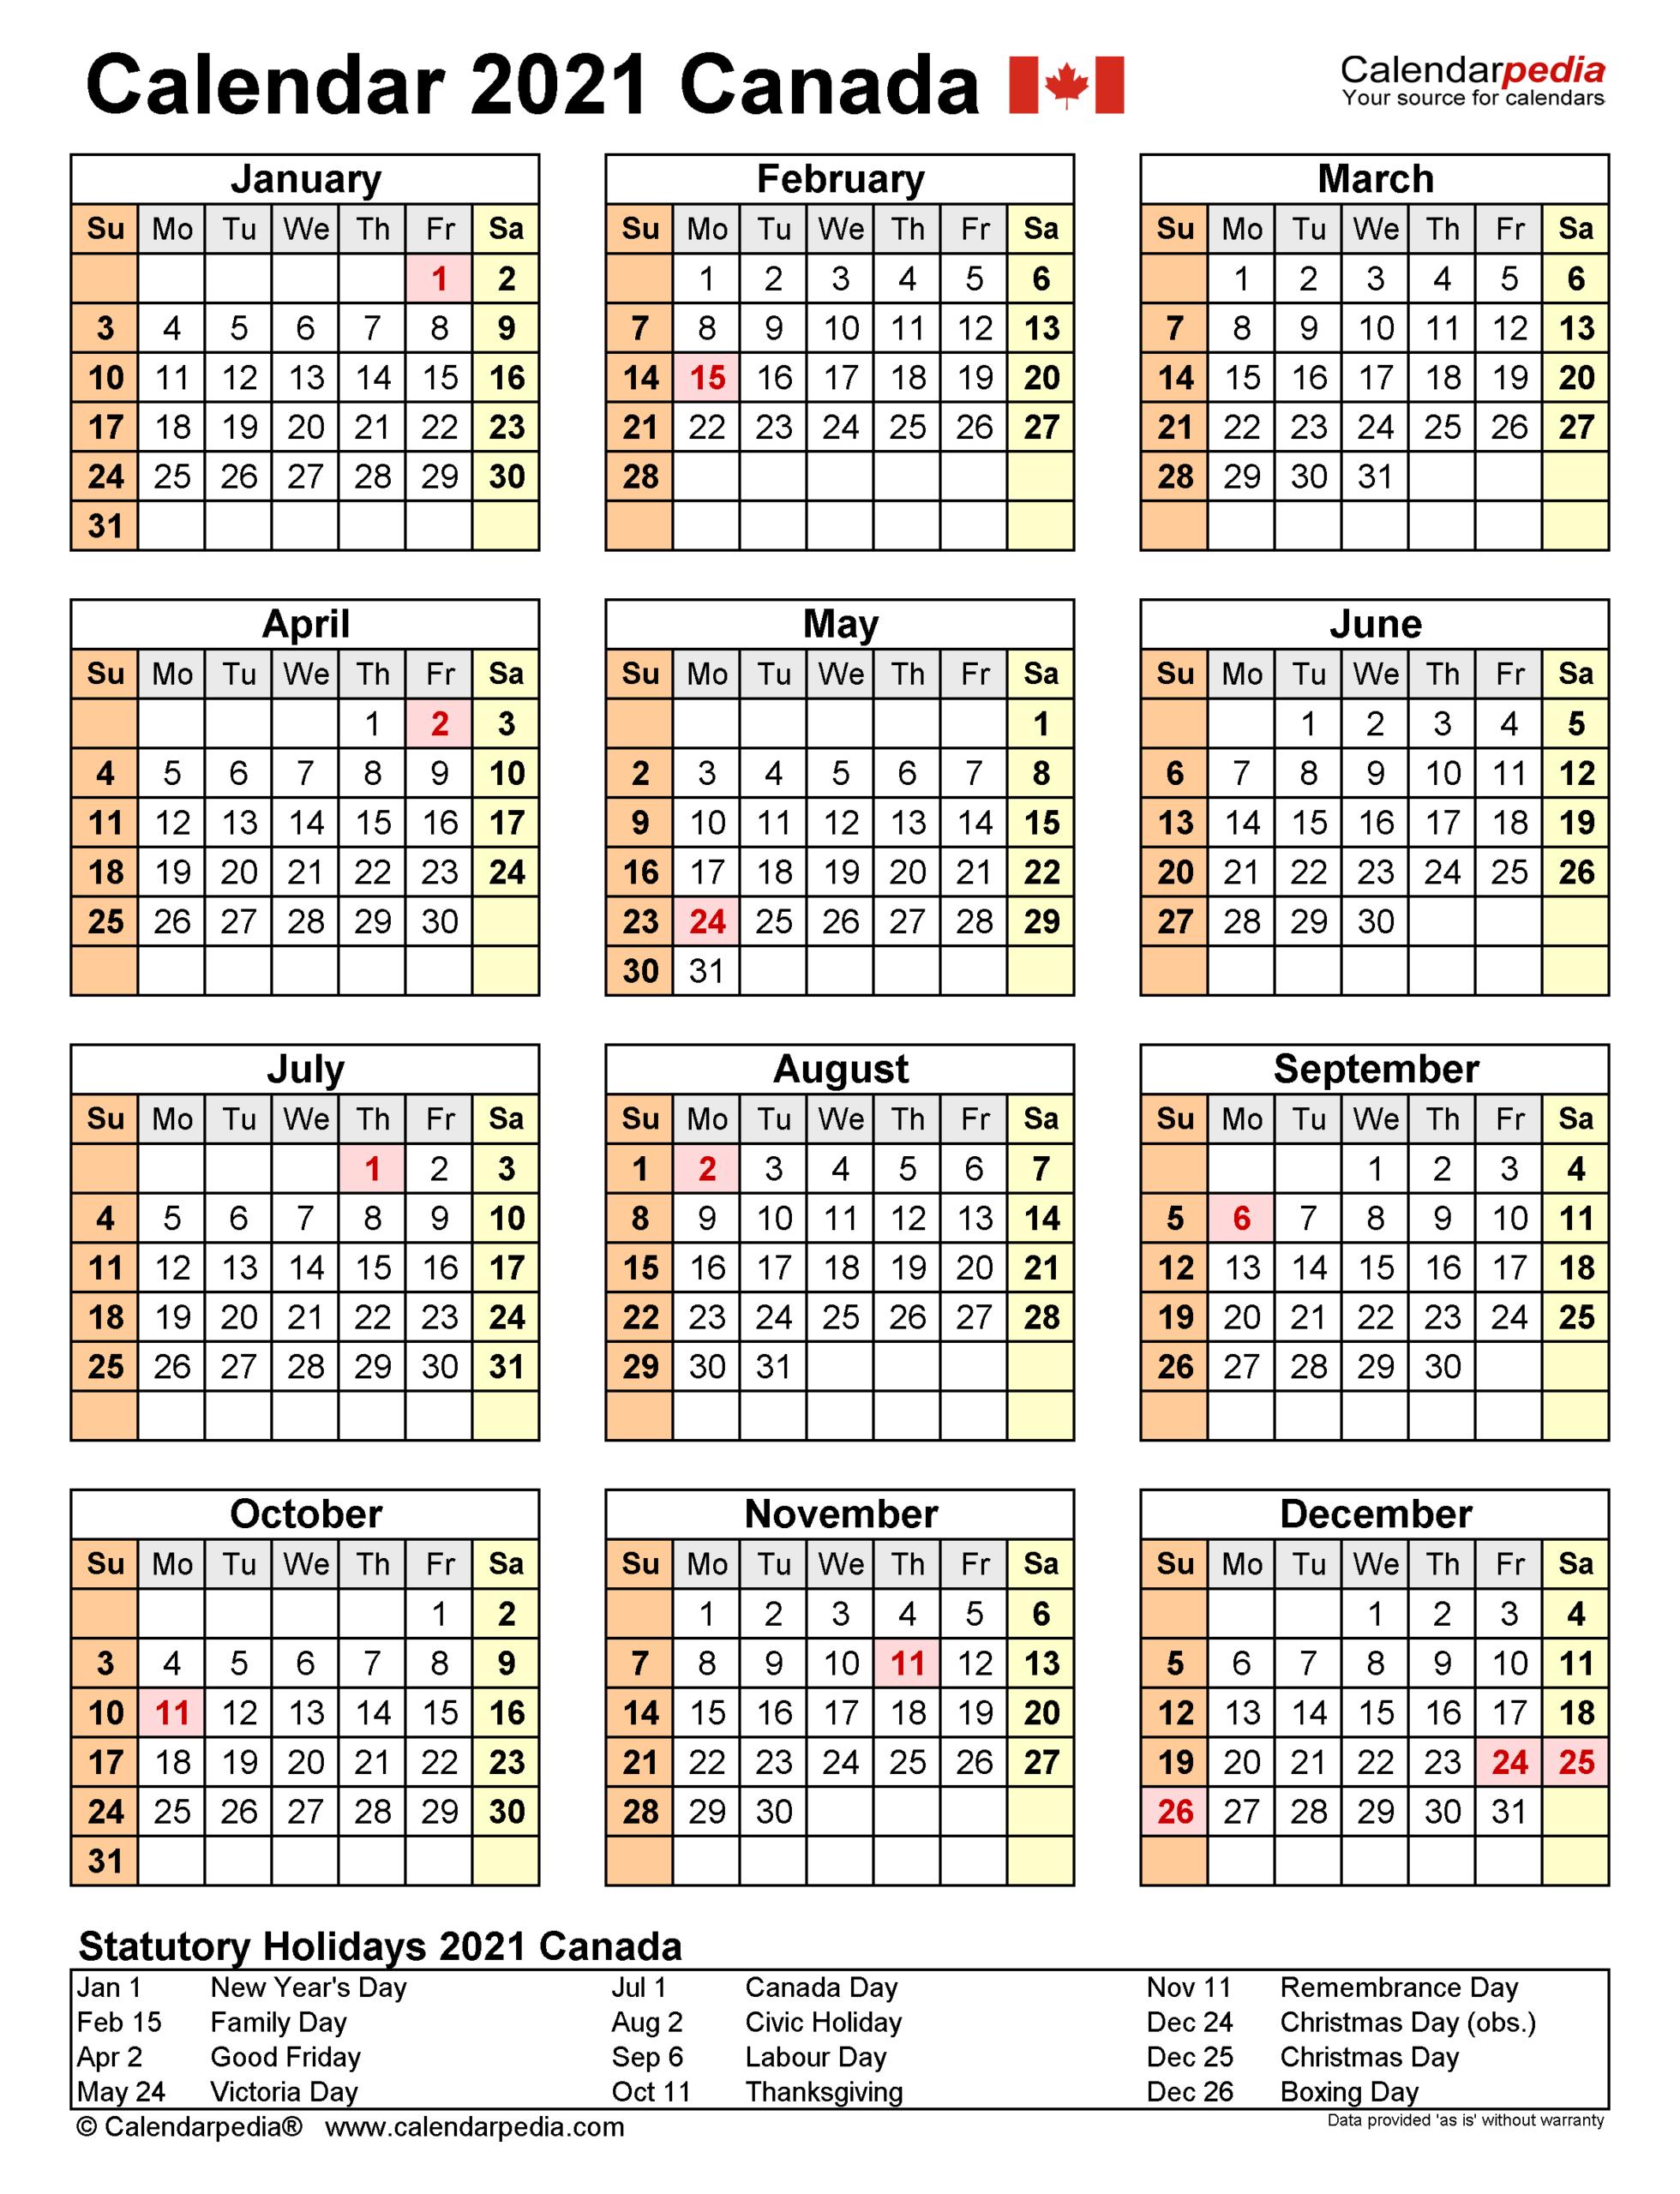 Canada Holiday Calendar 2021 - Holiday Calendar